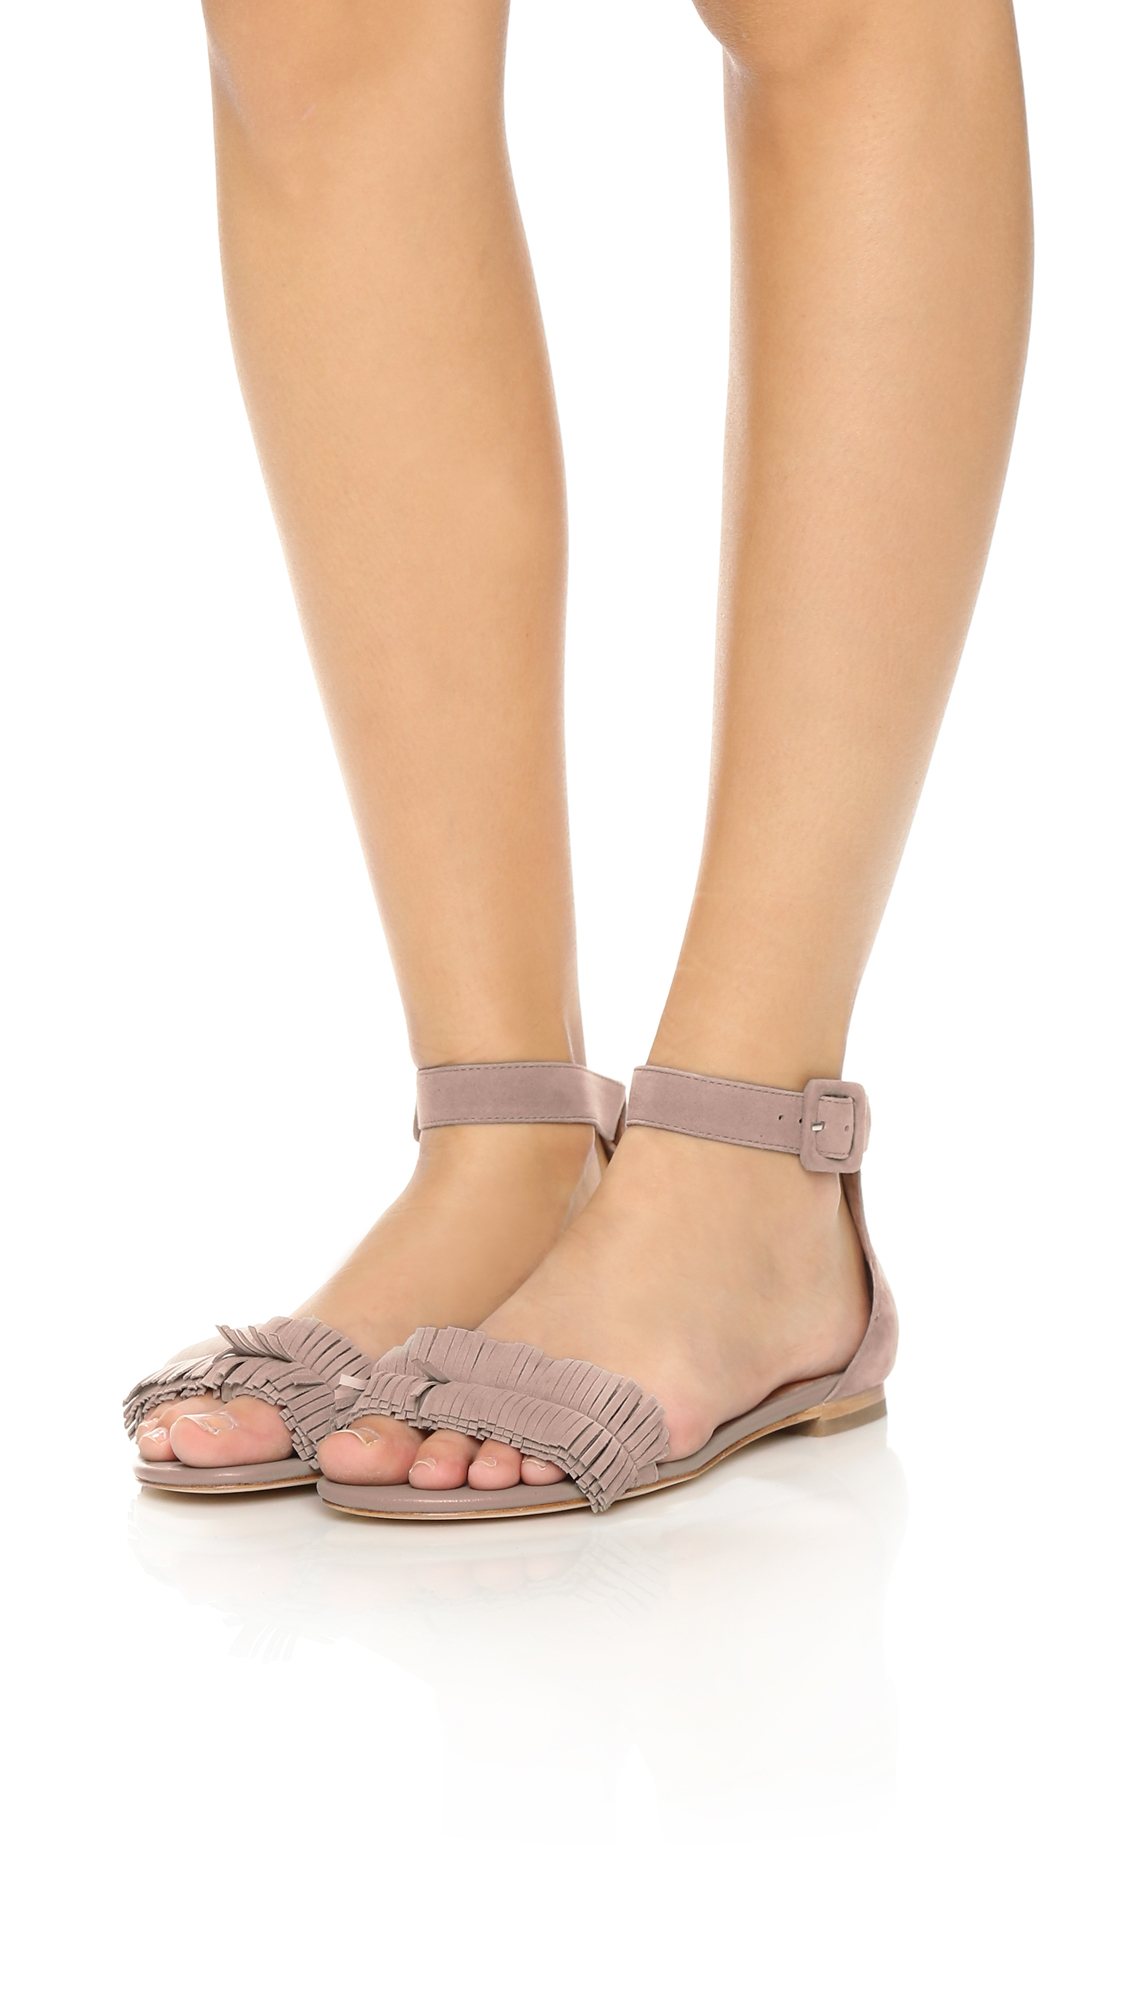 Lyst Joie Ferris Suede Flat Sandals Sandstone In Natural